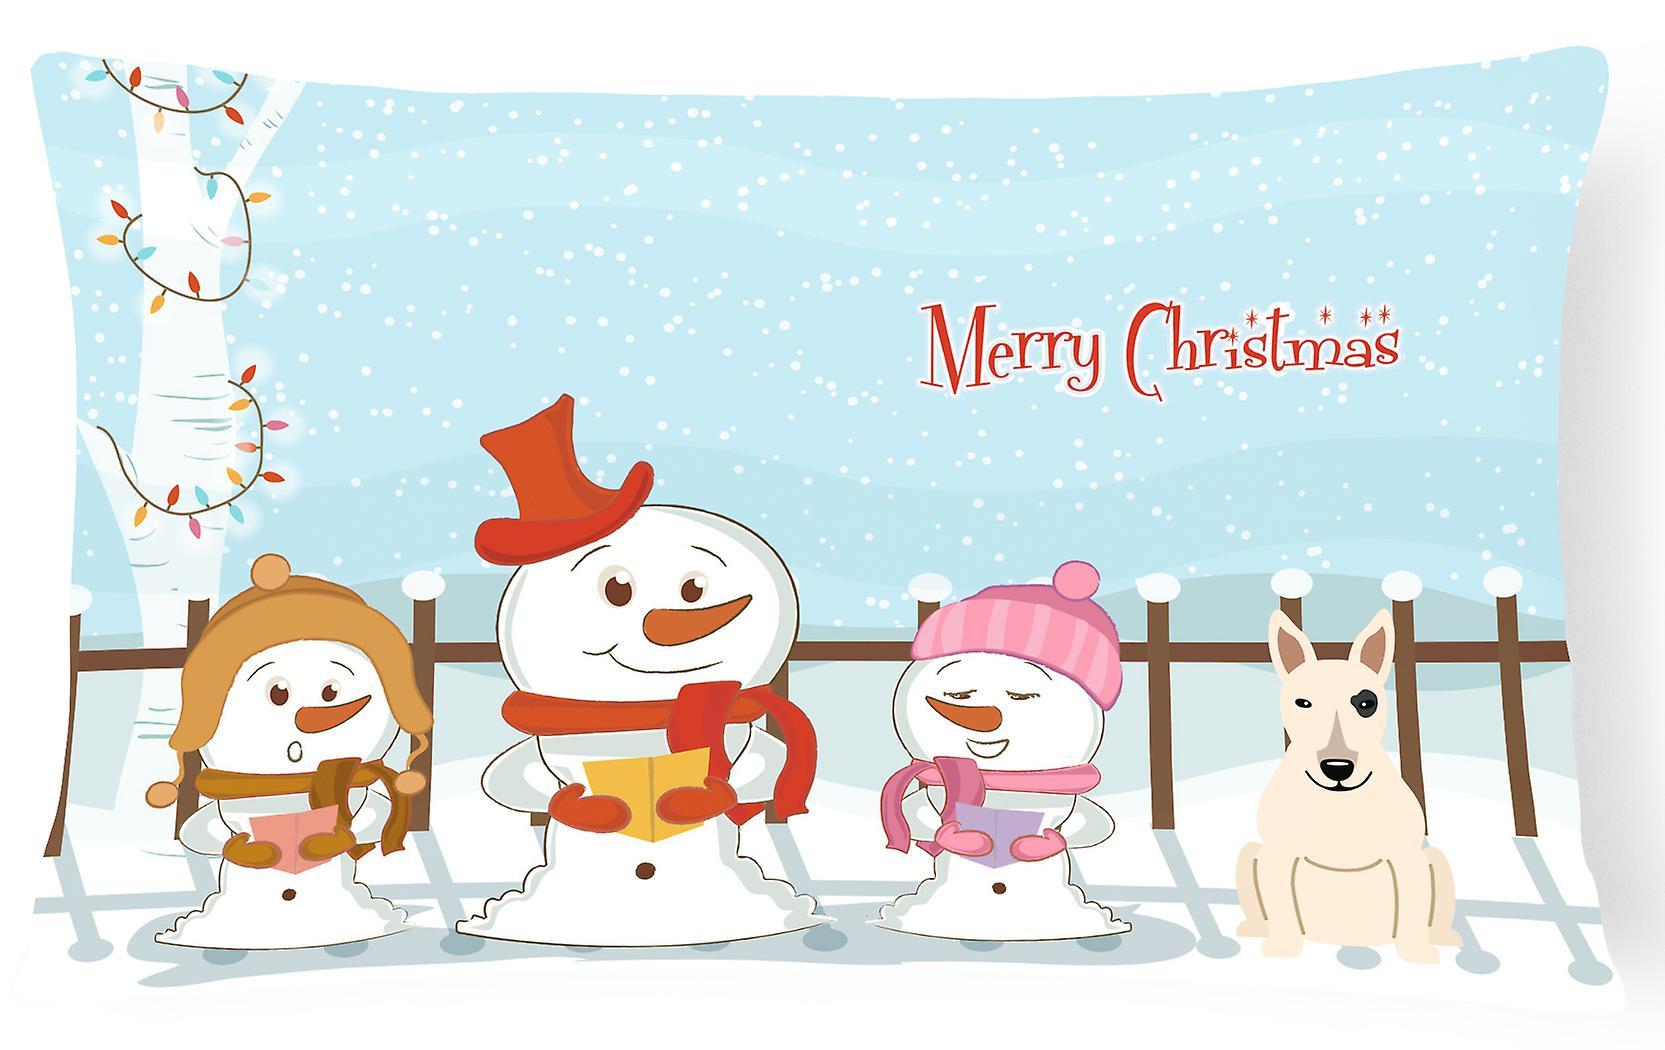 Blanc Oreiller Tissu Terrier Joyeux Noël Toile Décoratif Bull Chanteurs N8kXnP0wO